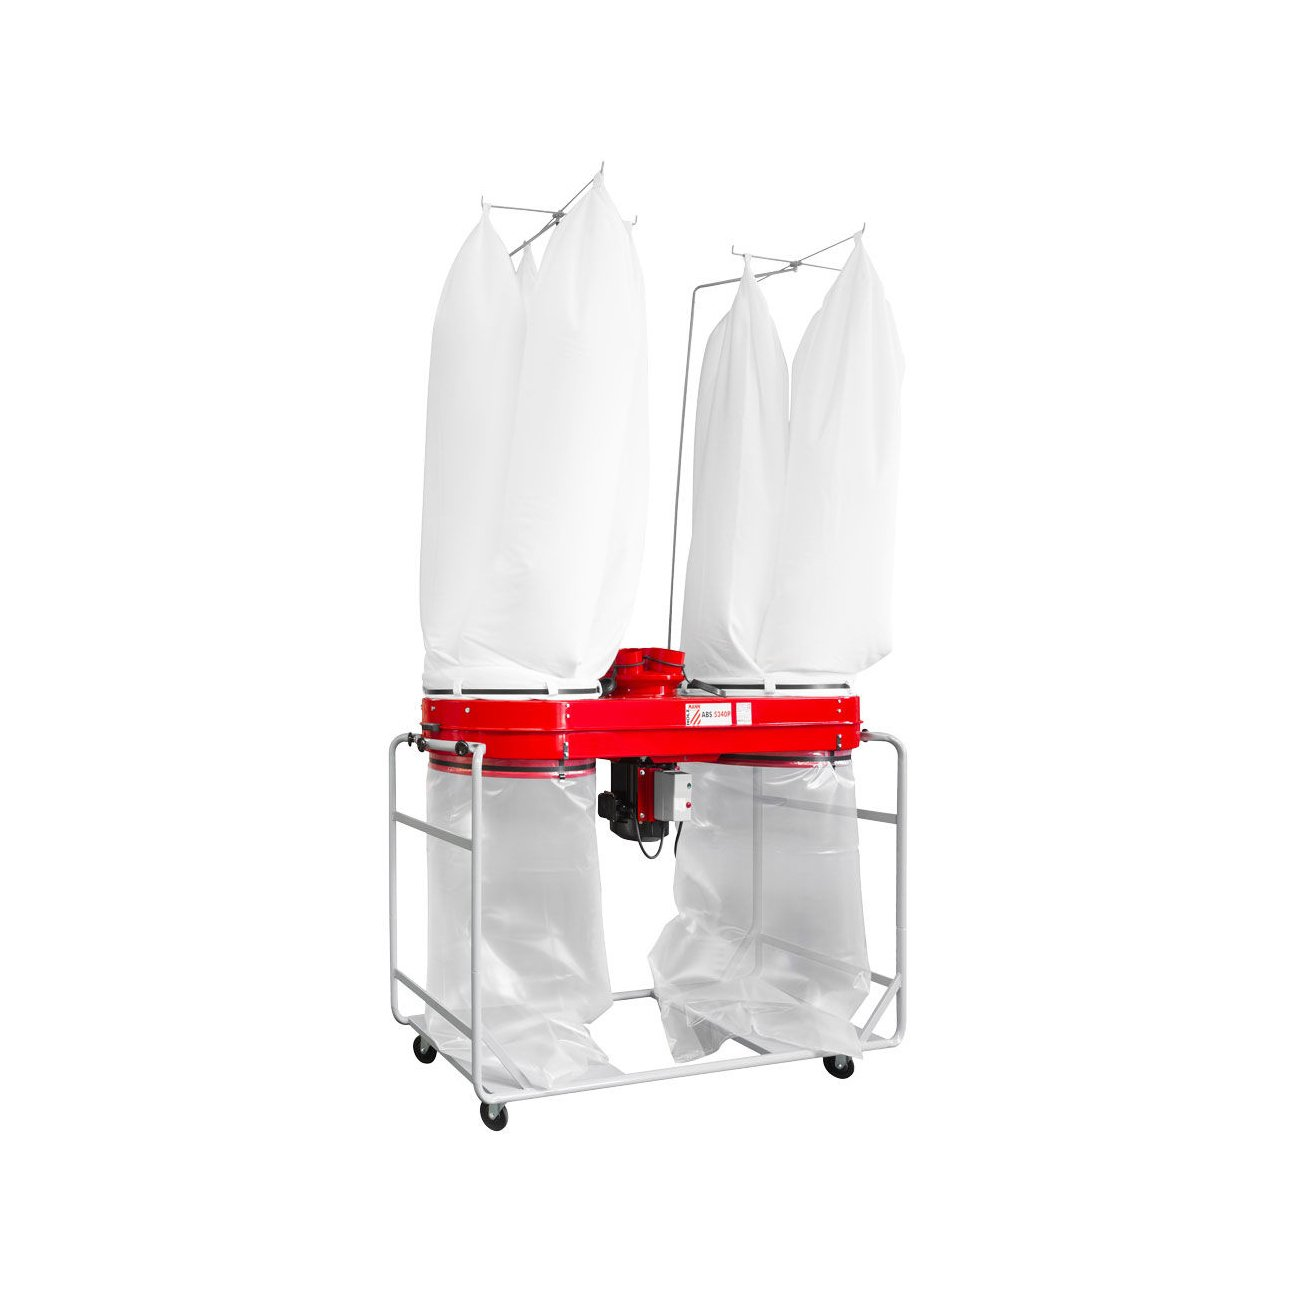 Holzmann - Aspirador de - Astillas de madera 2 x 280 litros 400 V ...